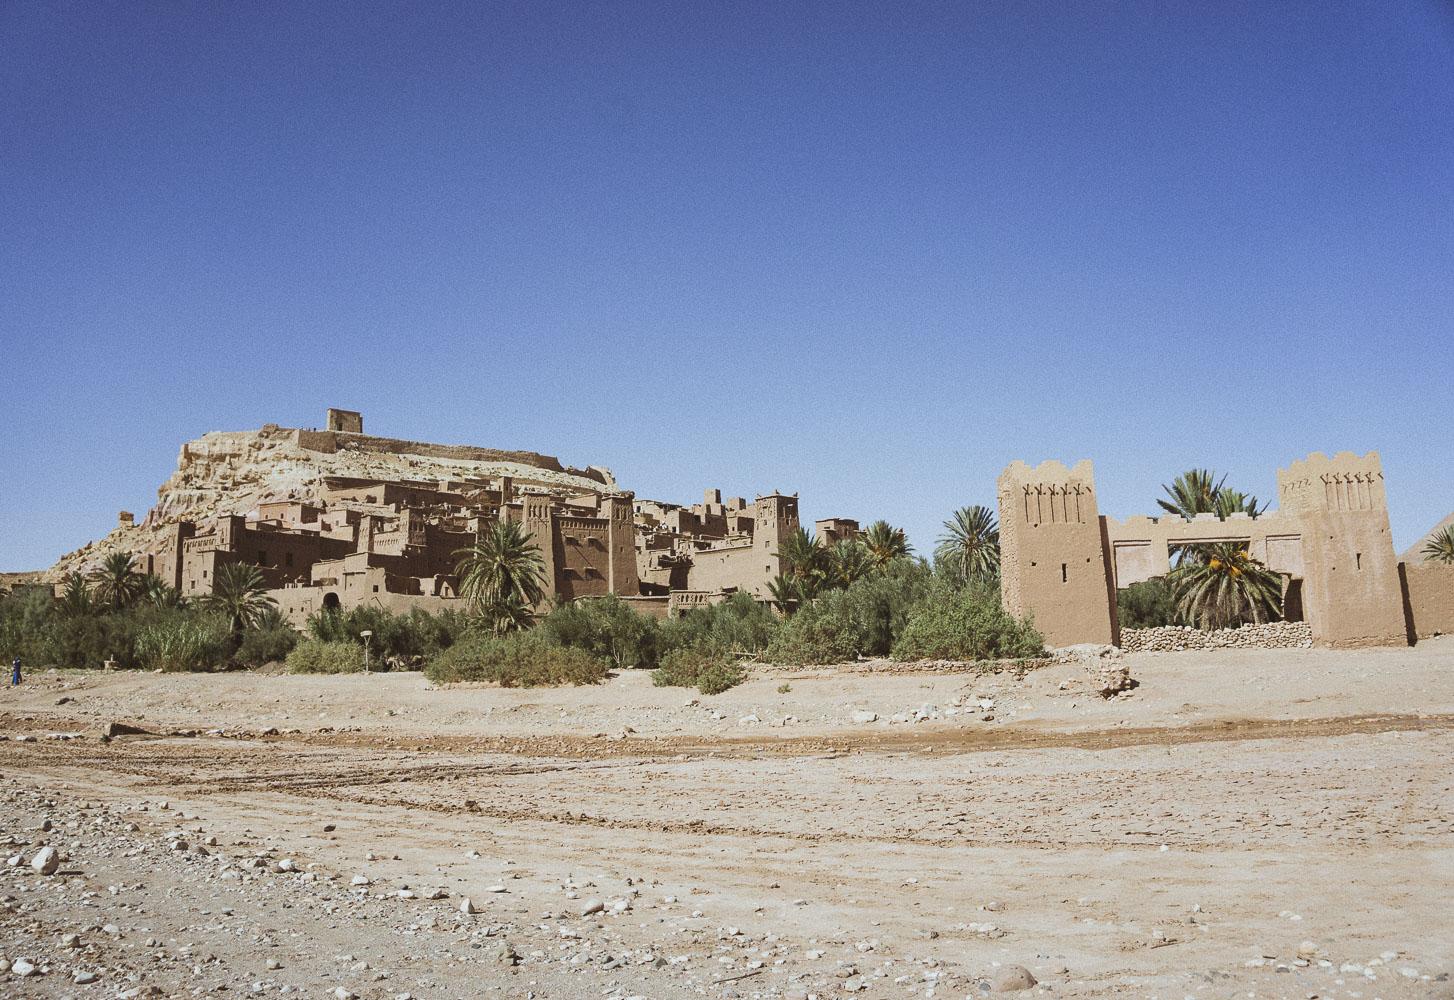 Village of Arabia.